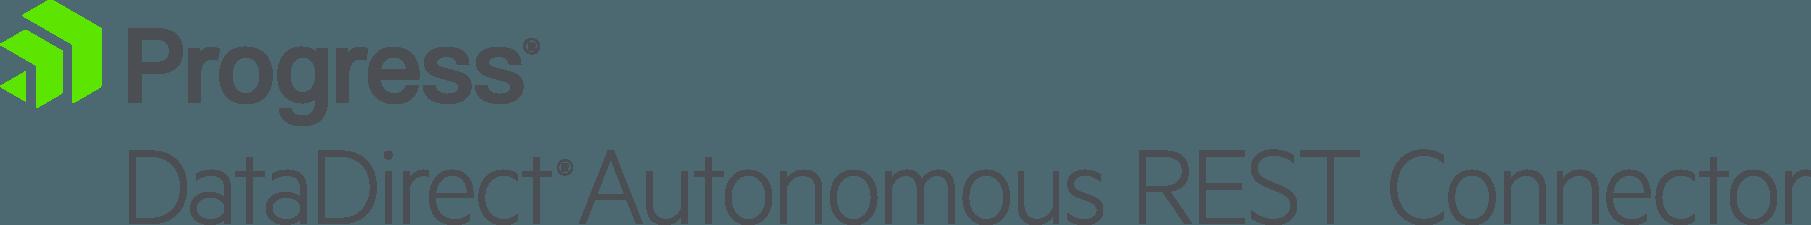 Progress_DataDirect_Autonomous REST Connector_Primary_Stacked